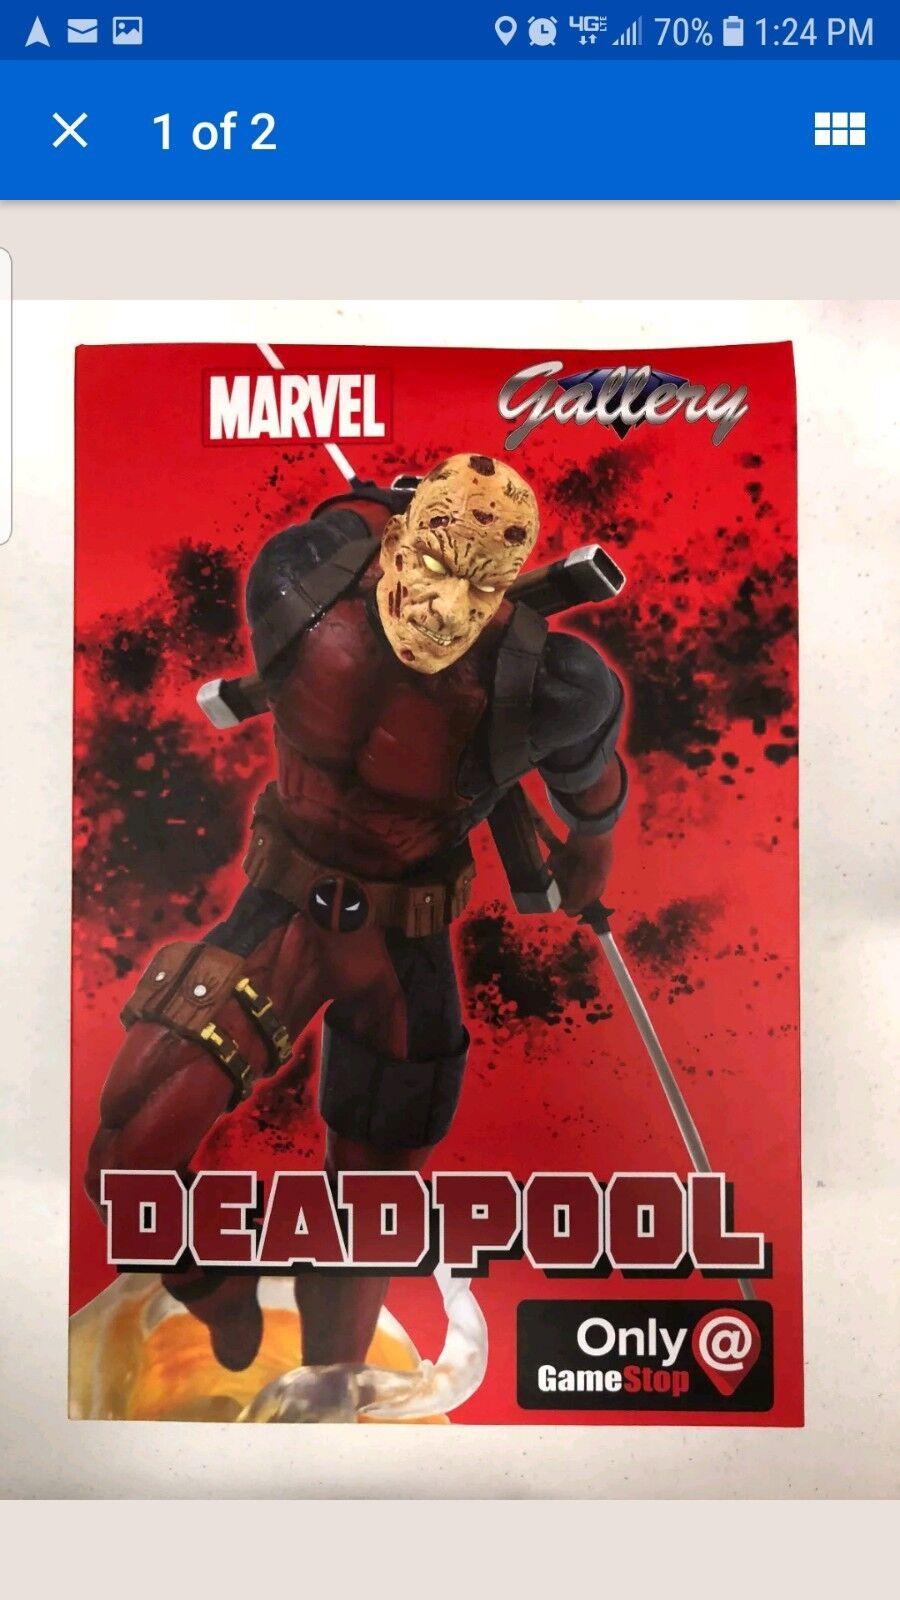 Marvel Deadpool Unmasked Unmasked Unmasked 9  PVC Figure GameStop Exlusive Diamond Gallery 9ff78a